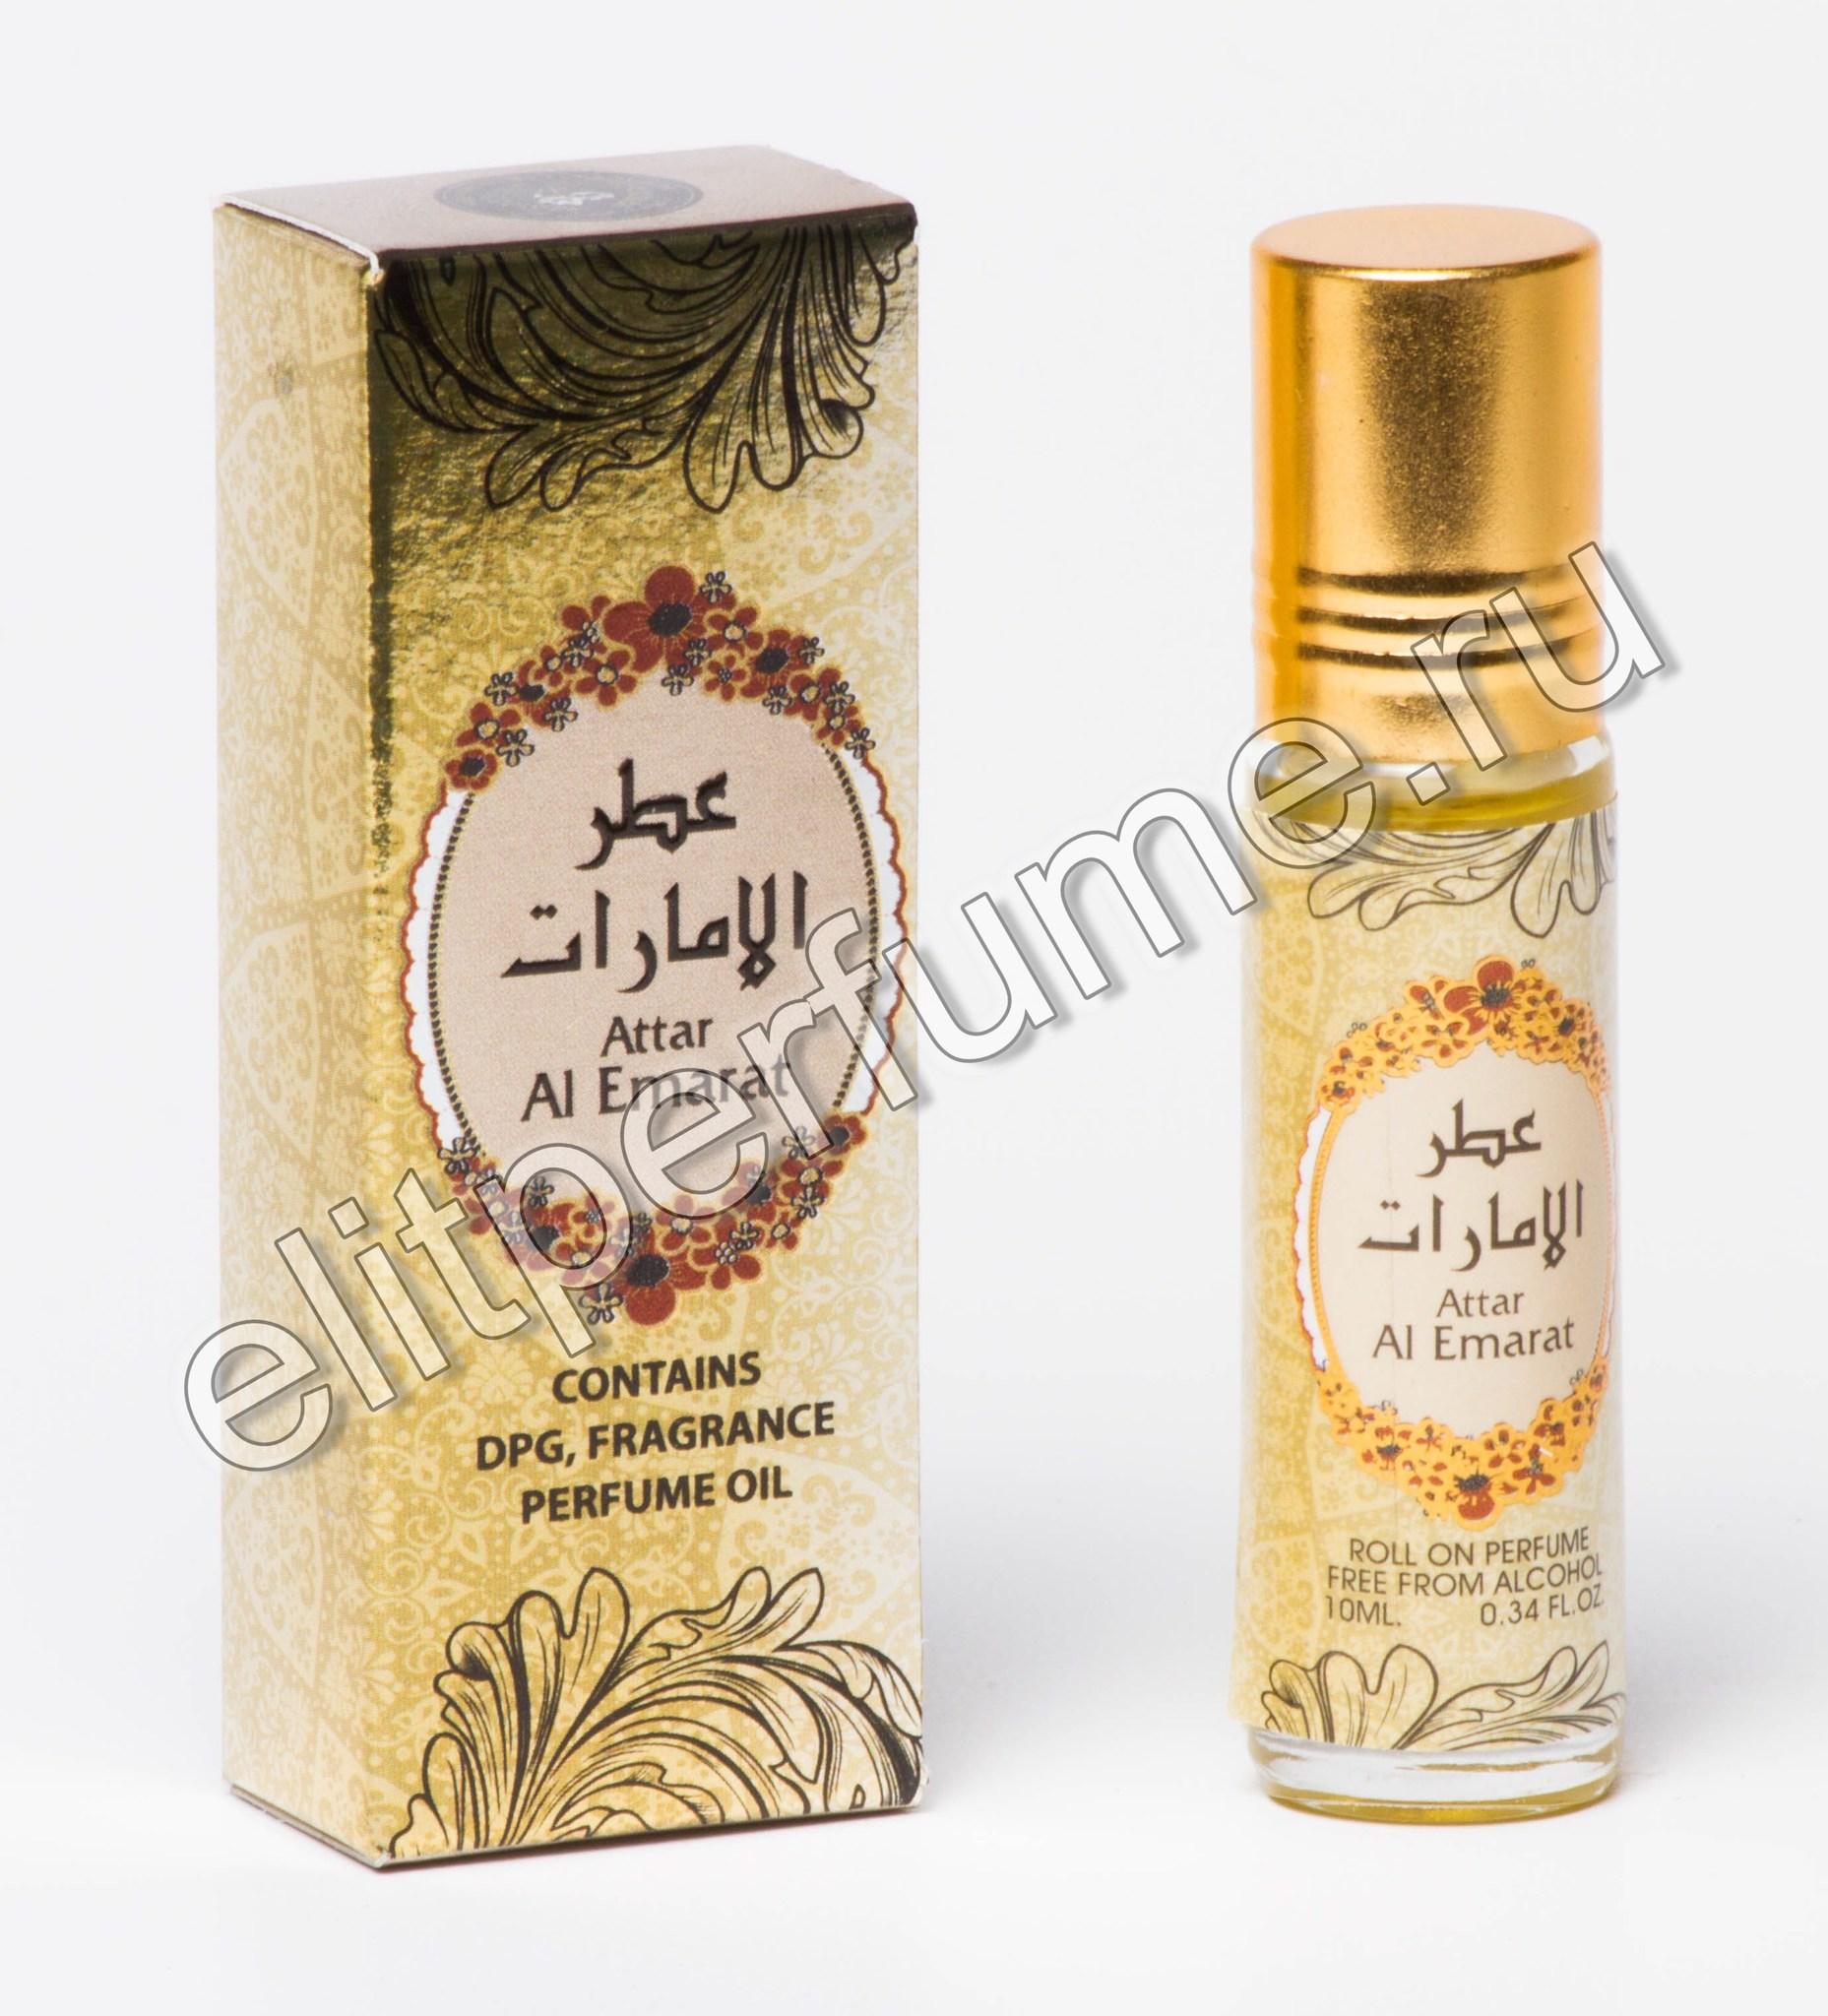 Attar al Emarat Аттар аль Эмарат 10 мл арабские масляные духи от Ард Аль Заафаран Ard Al Zaafaran